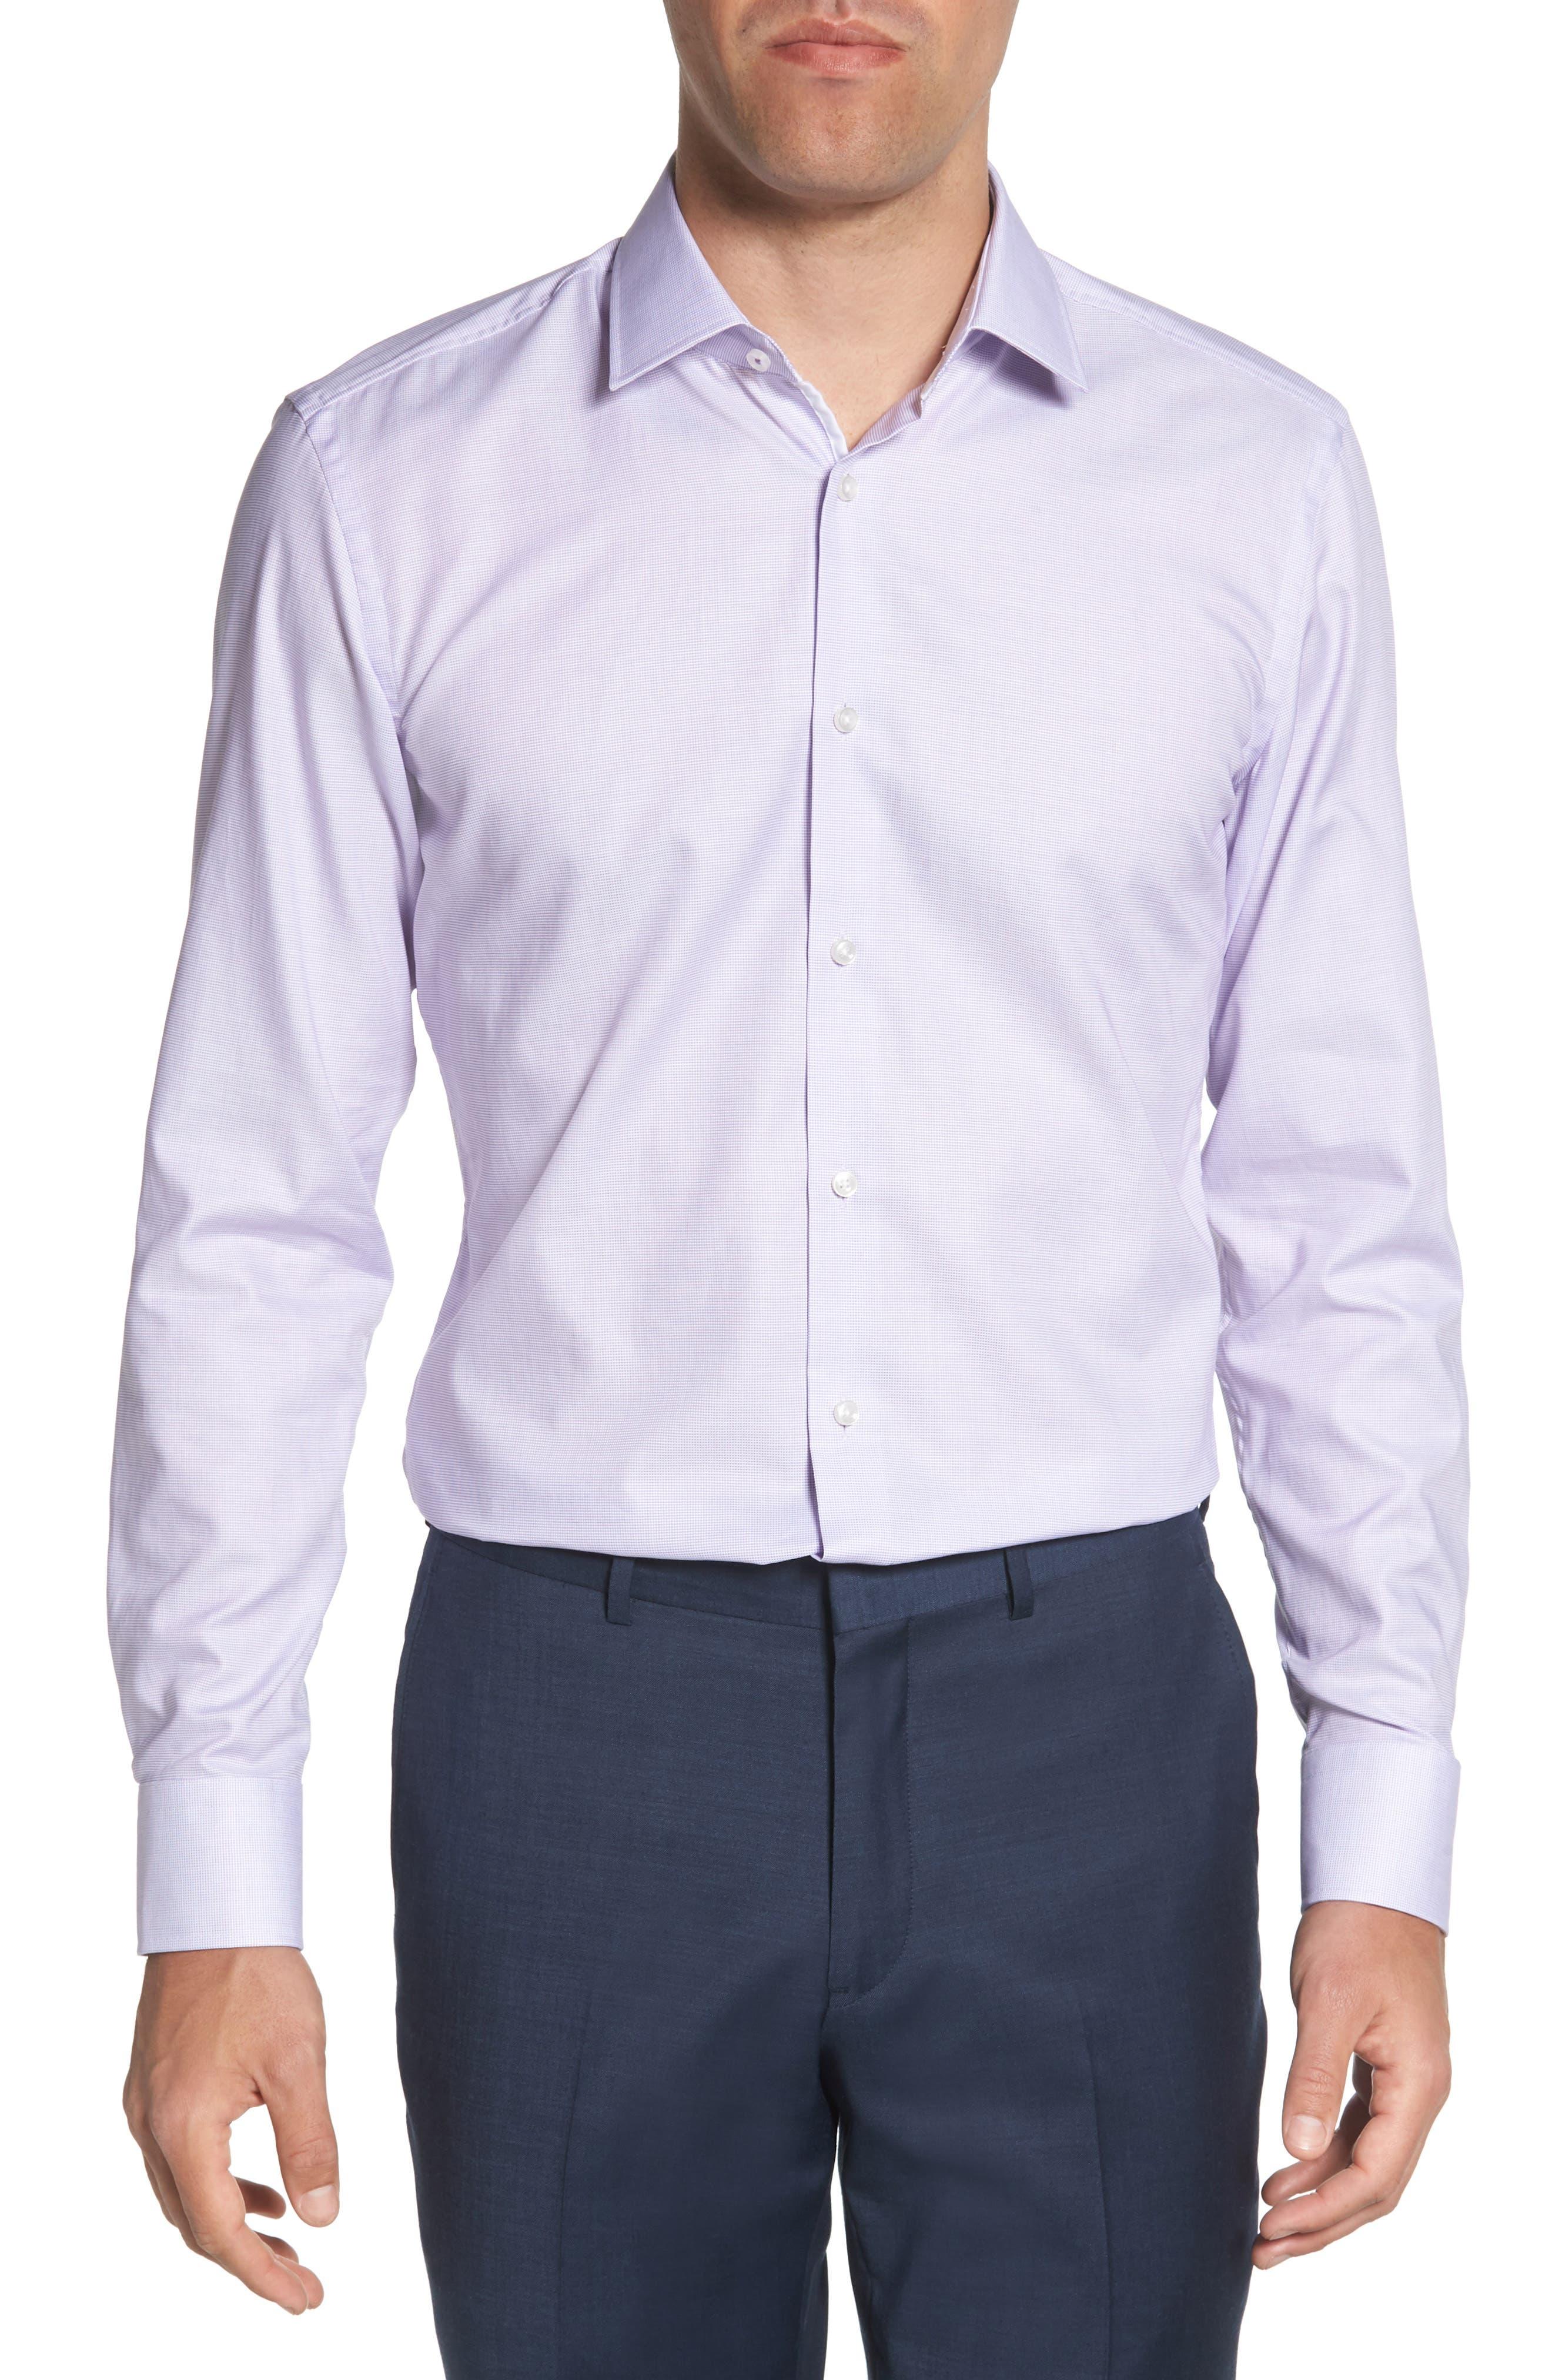 Jesse Slim Fit Dress Shirt,                             Main thumbnail 1, color,                             512